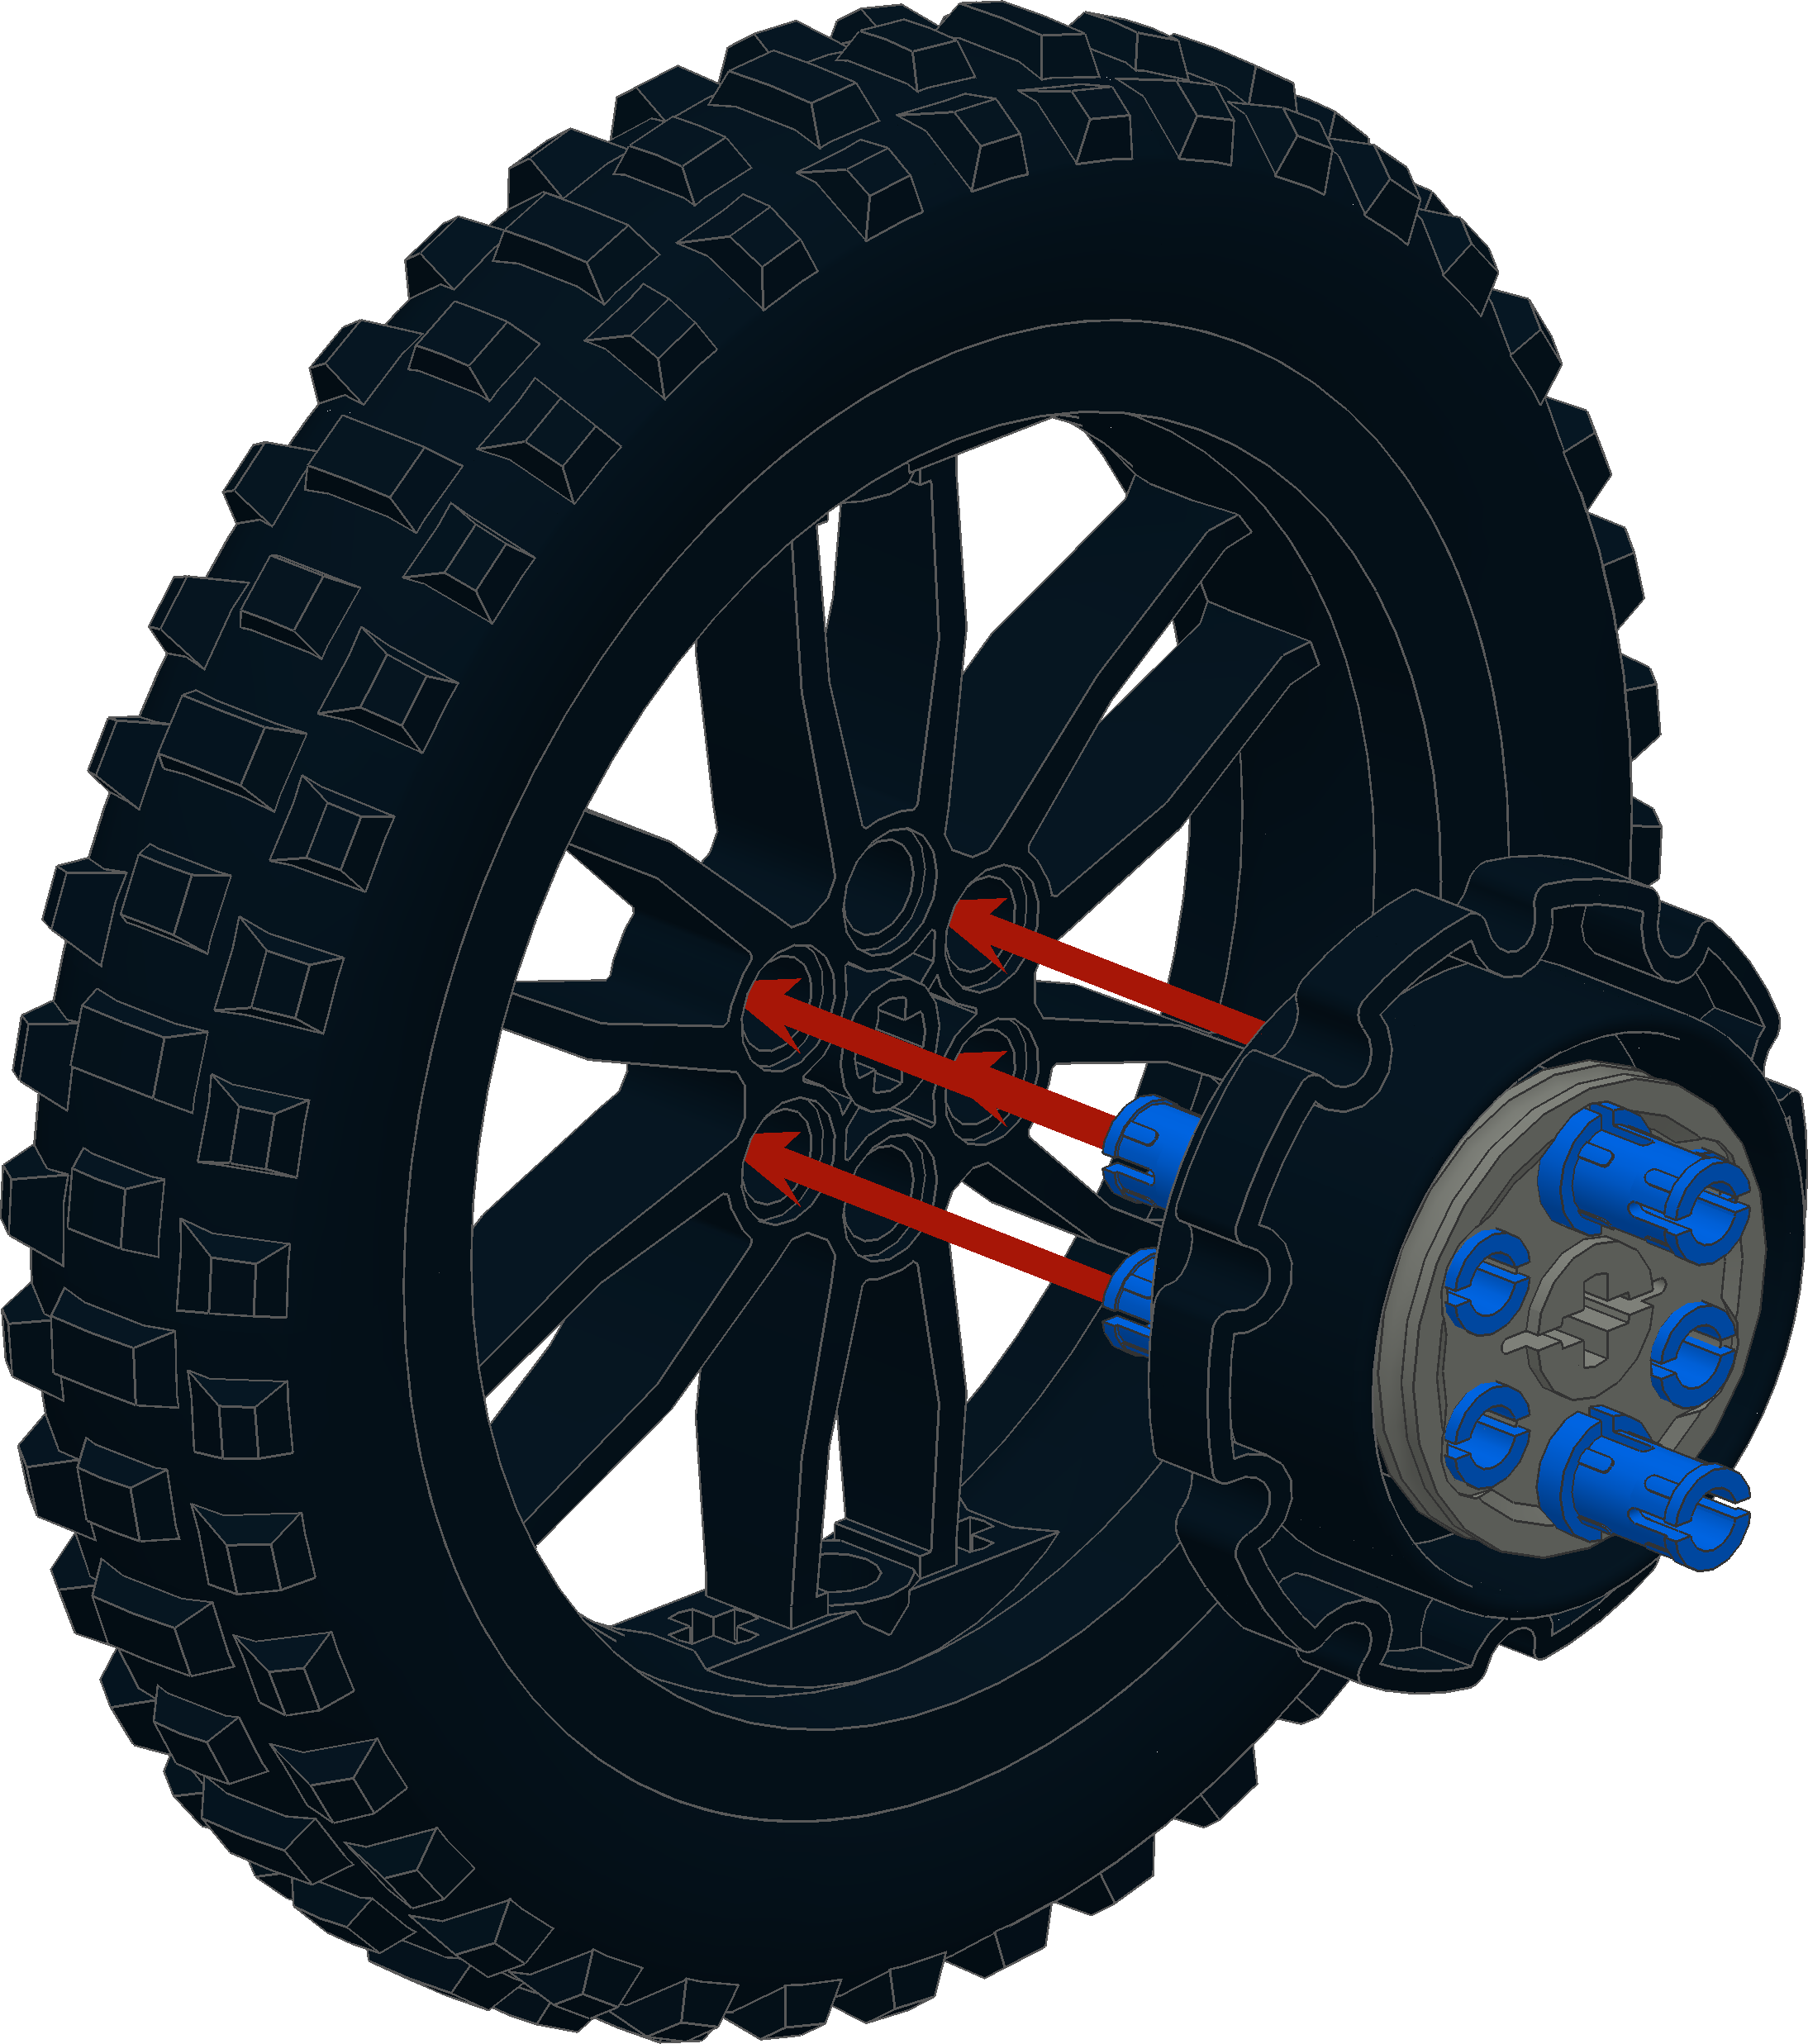 ev3wayet18_wheel_arrow_1_0_0_0_1_0_0_0_1_4_4960_600_DPI_1.png